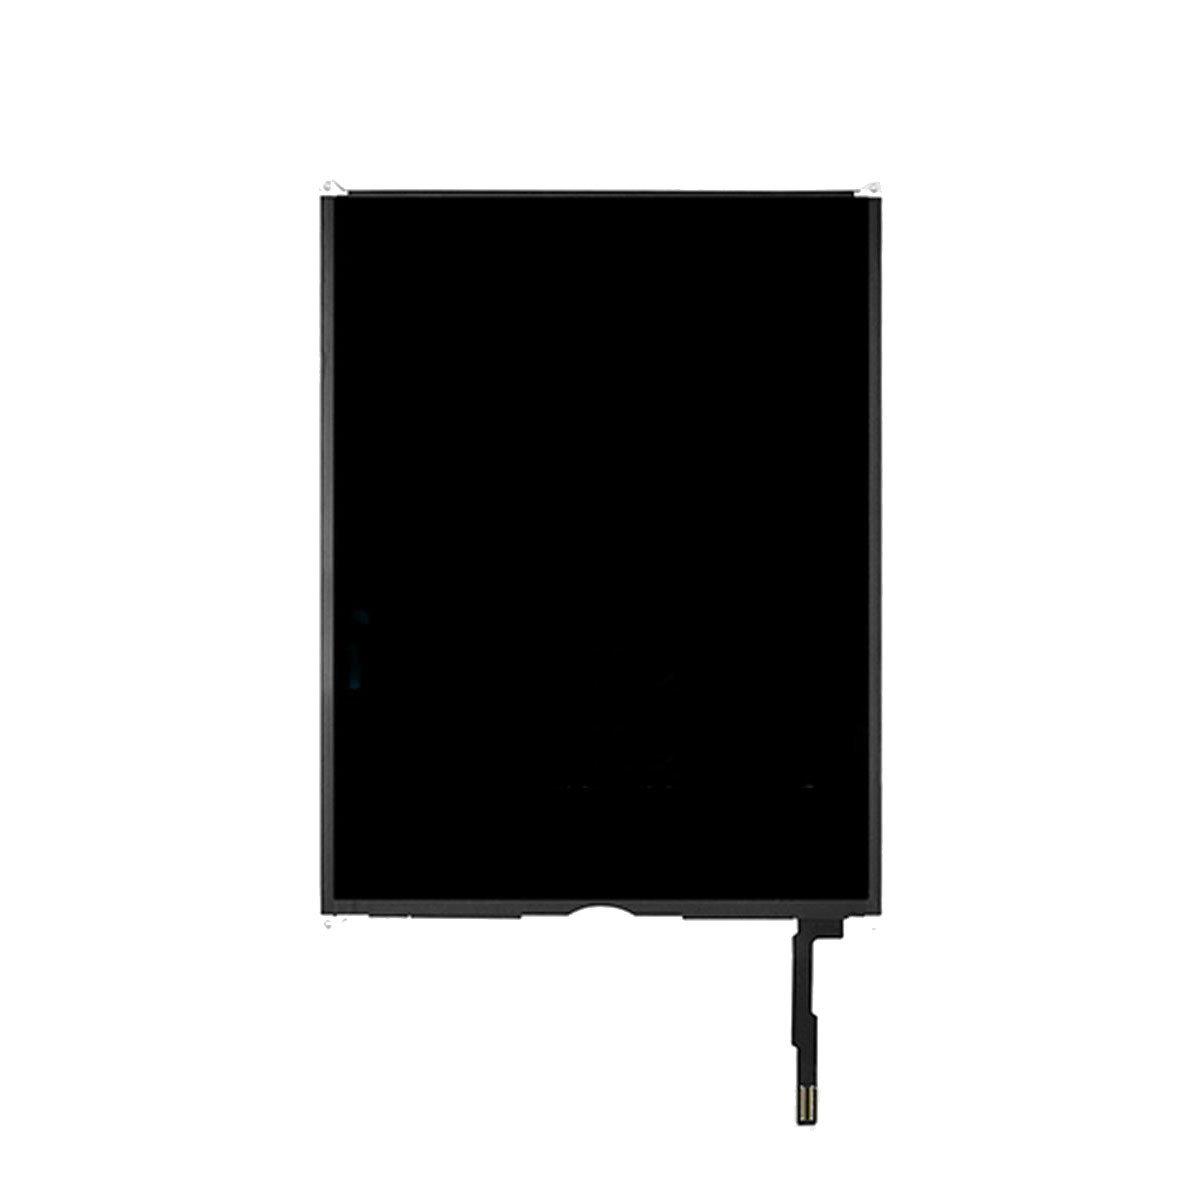 iPad Air 1 / iPad 5 (2017) LCD Screen Replacement